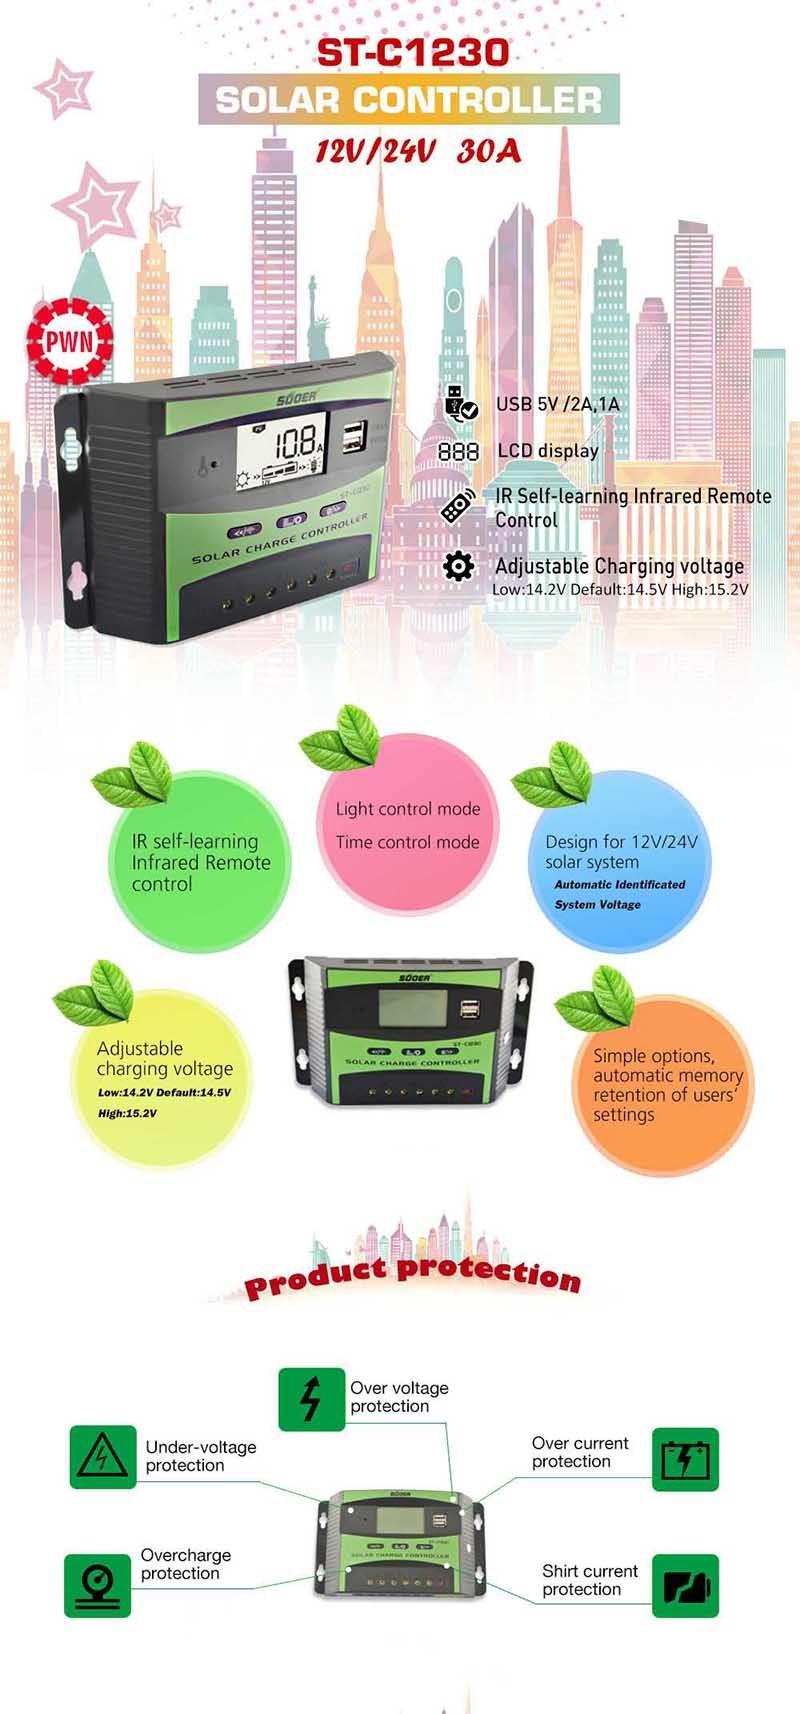 tps 1230 solar regulator manual